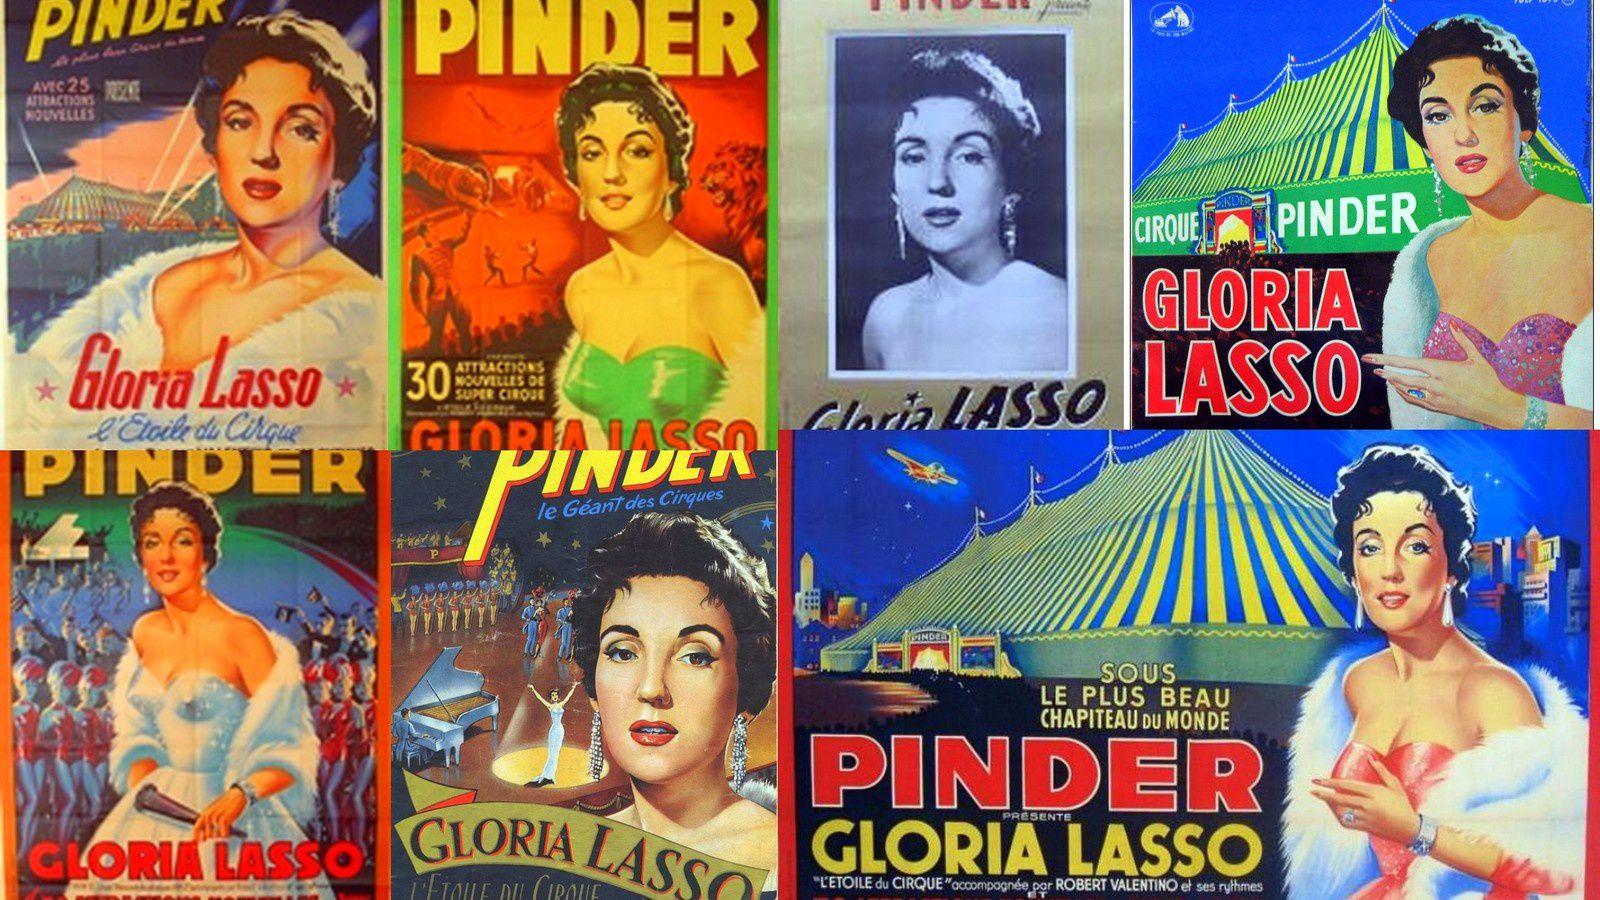 Gloria Lasso (1922-2005) la chanteuse qui a manqué de couler le cirque Pinder